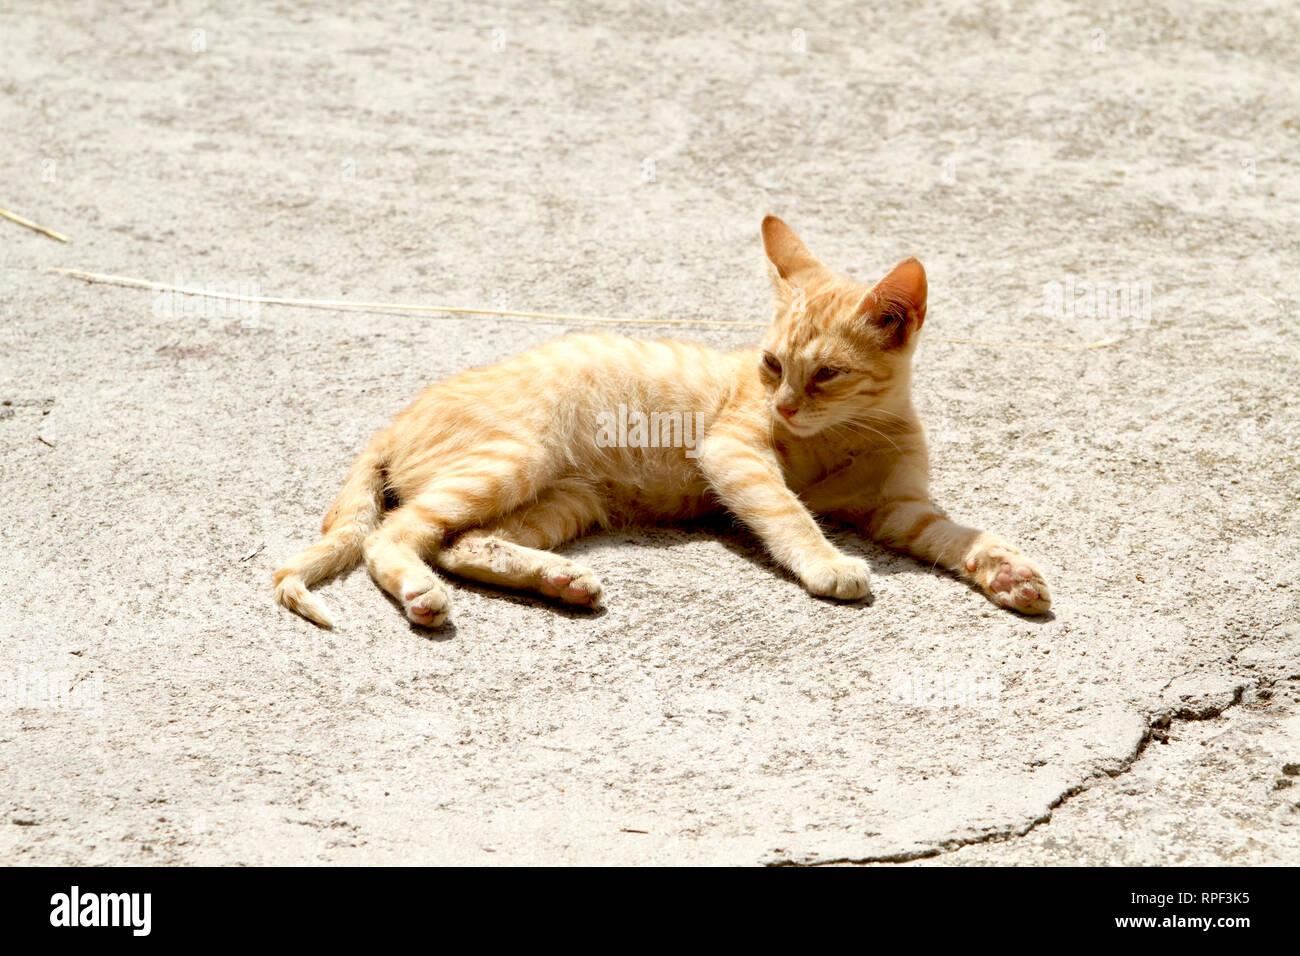 Alvito-Red cat resting on warm concrete - Stock Image